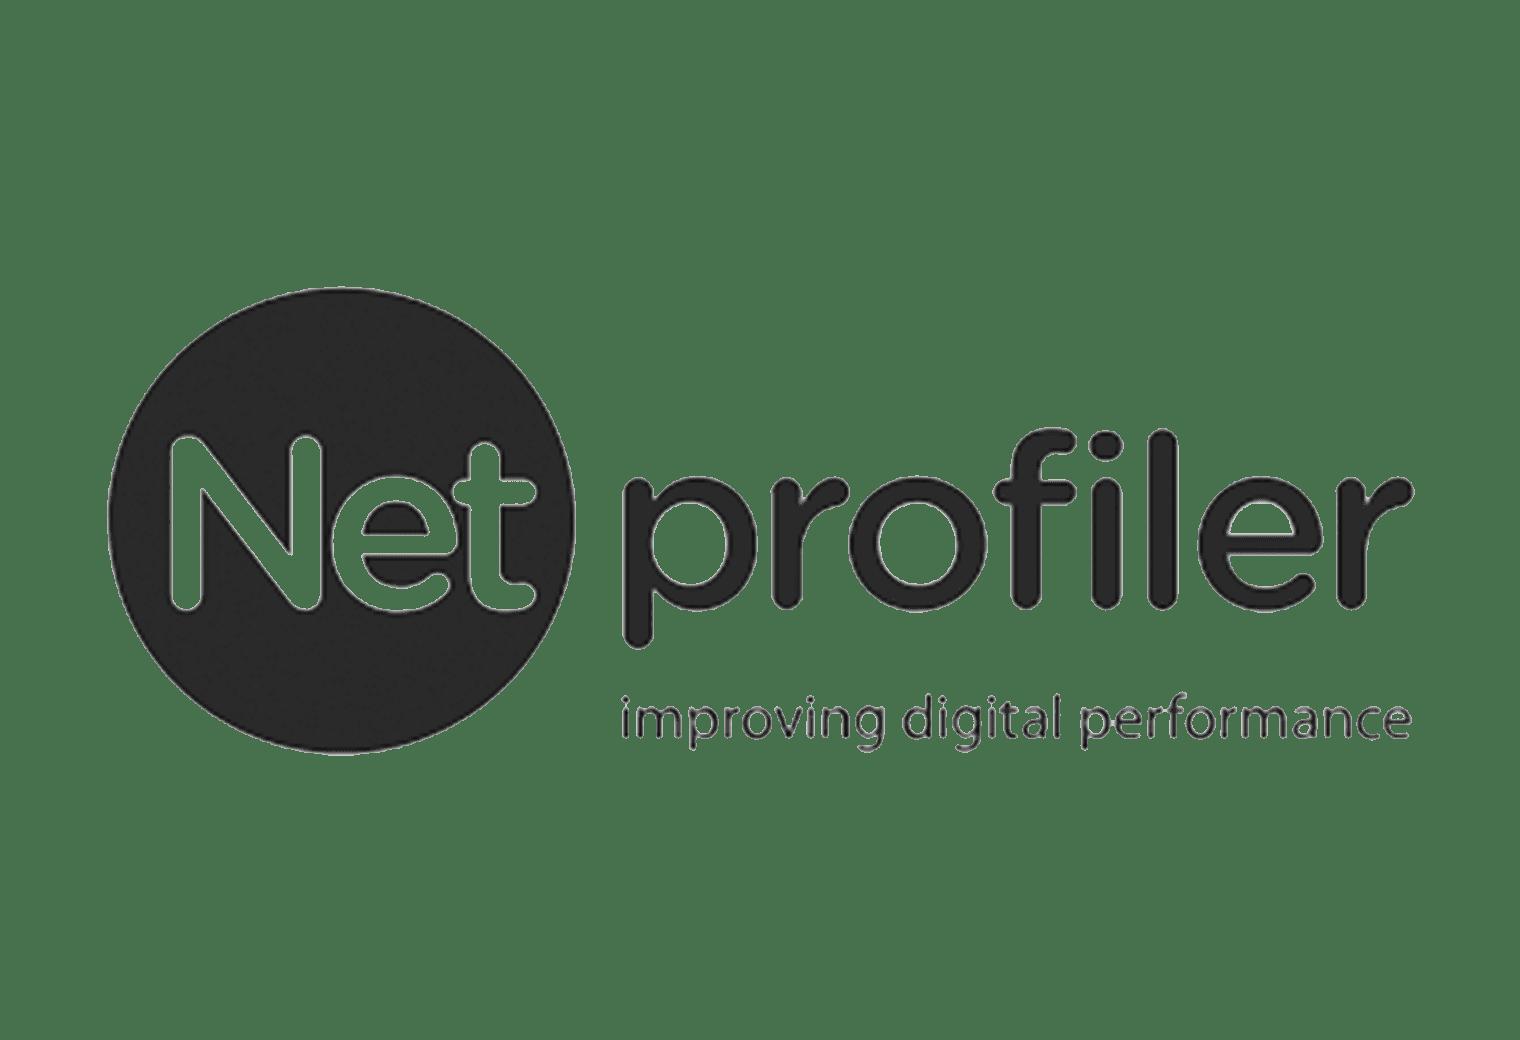 Net profiler